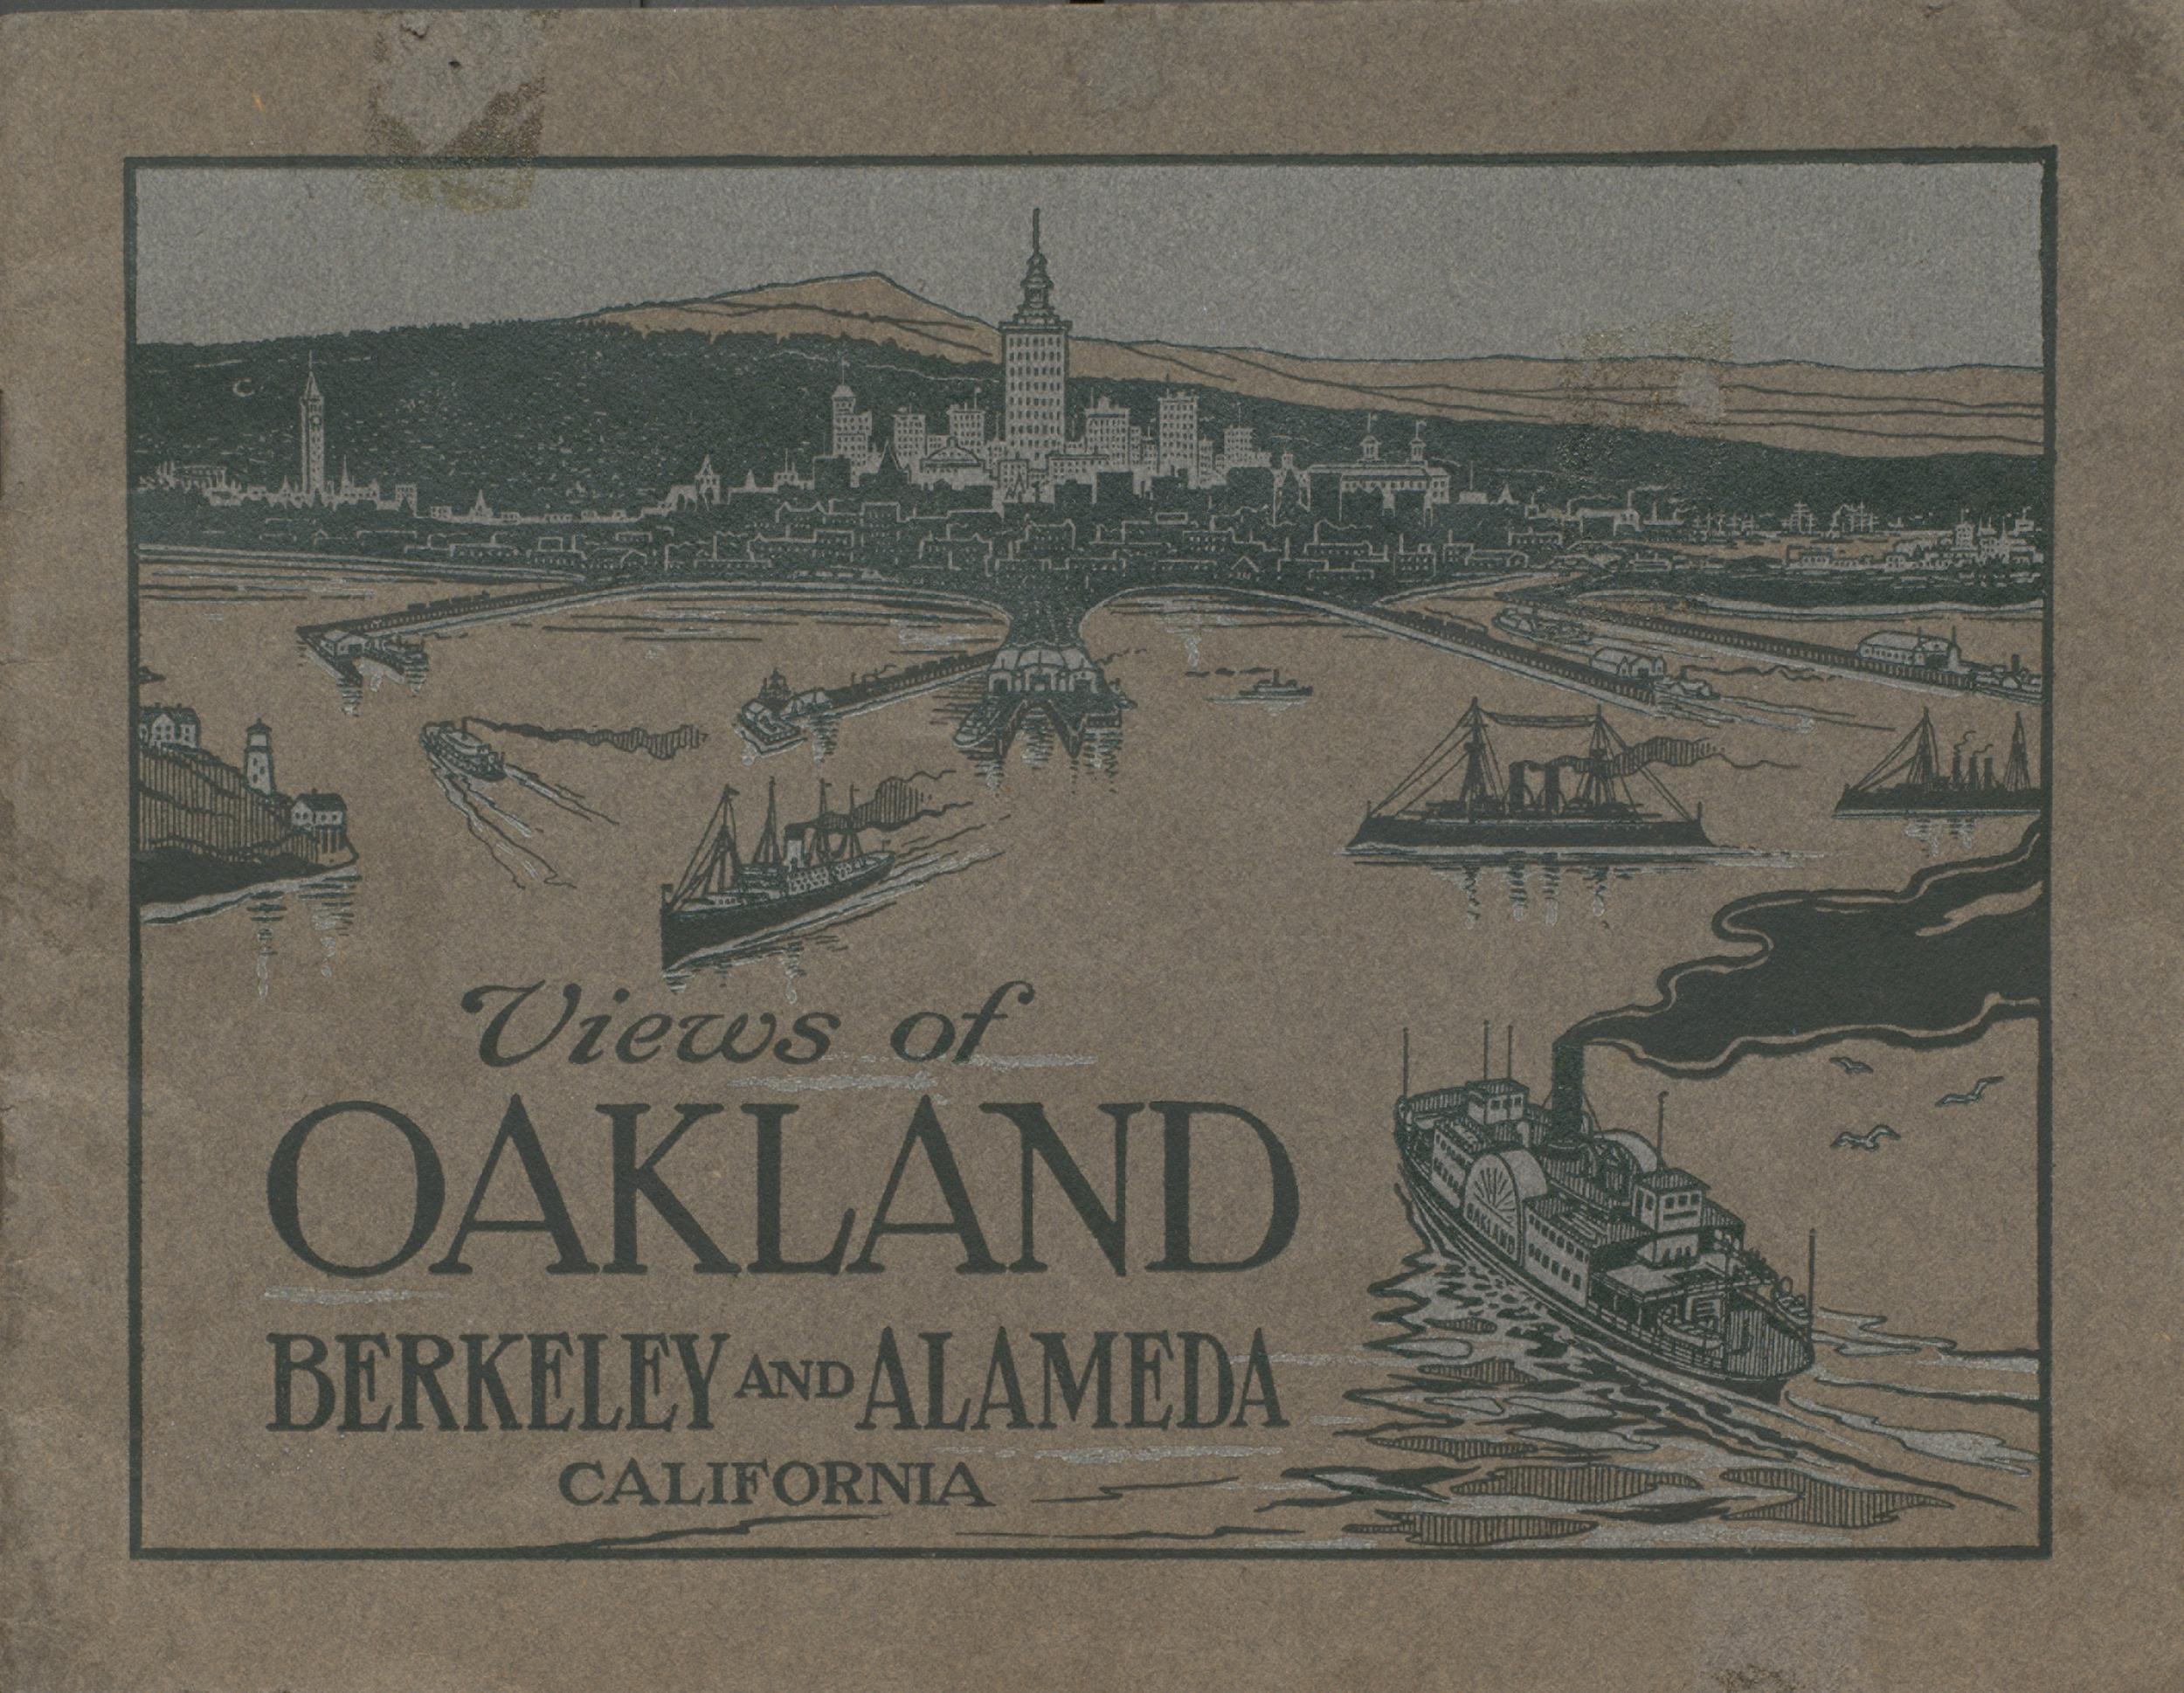 Views of Oakland Berkeley and Alameda California. Cover.